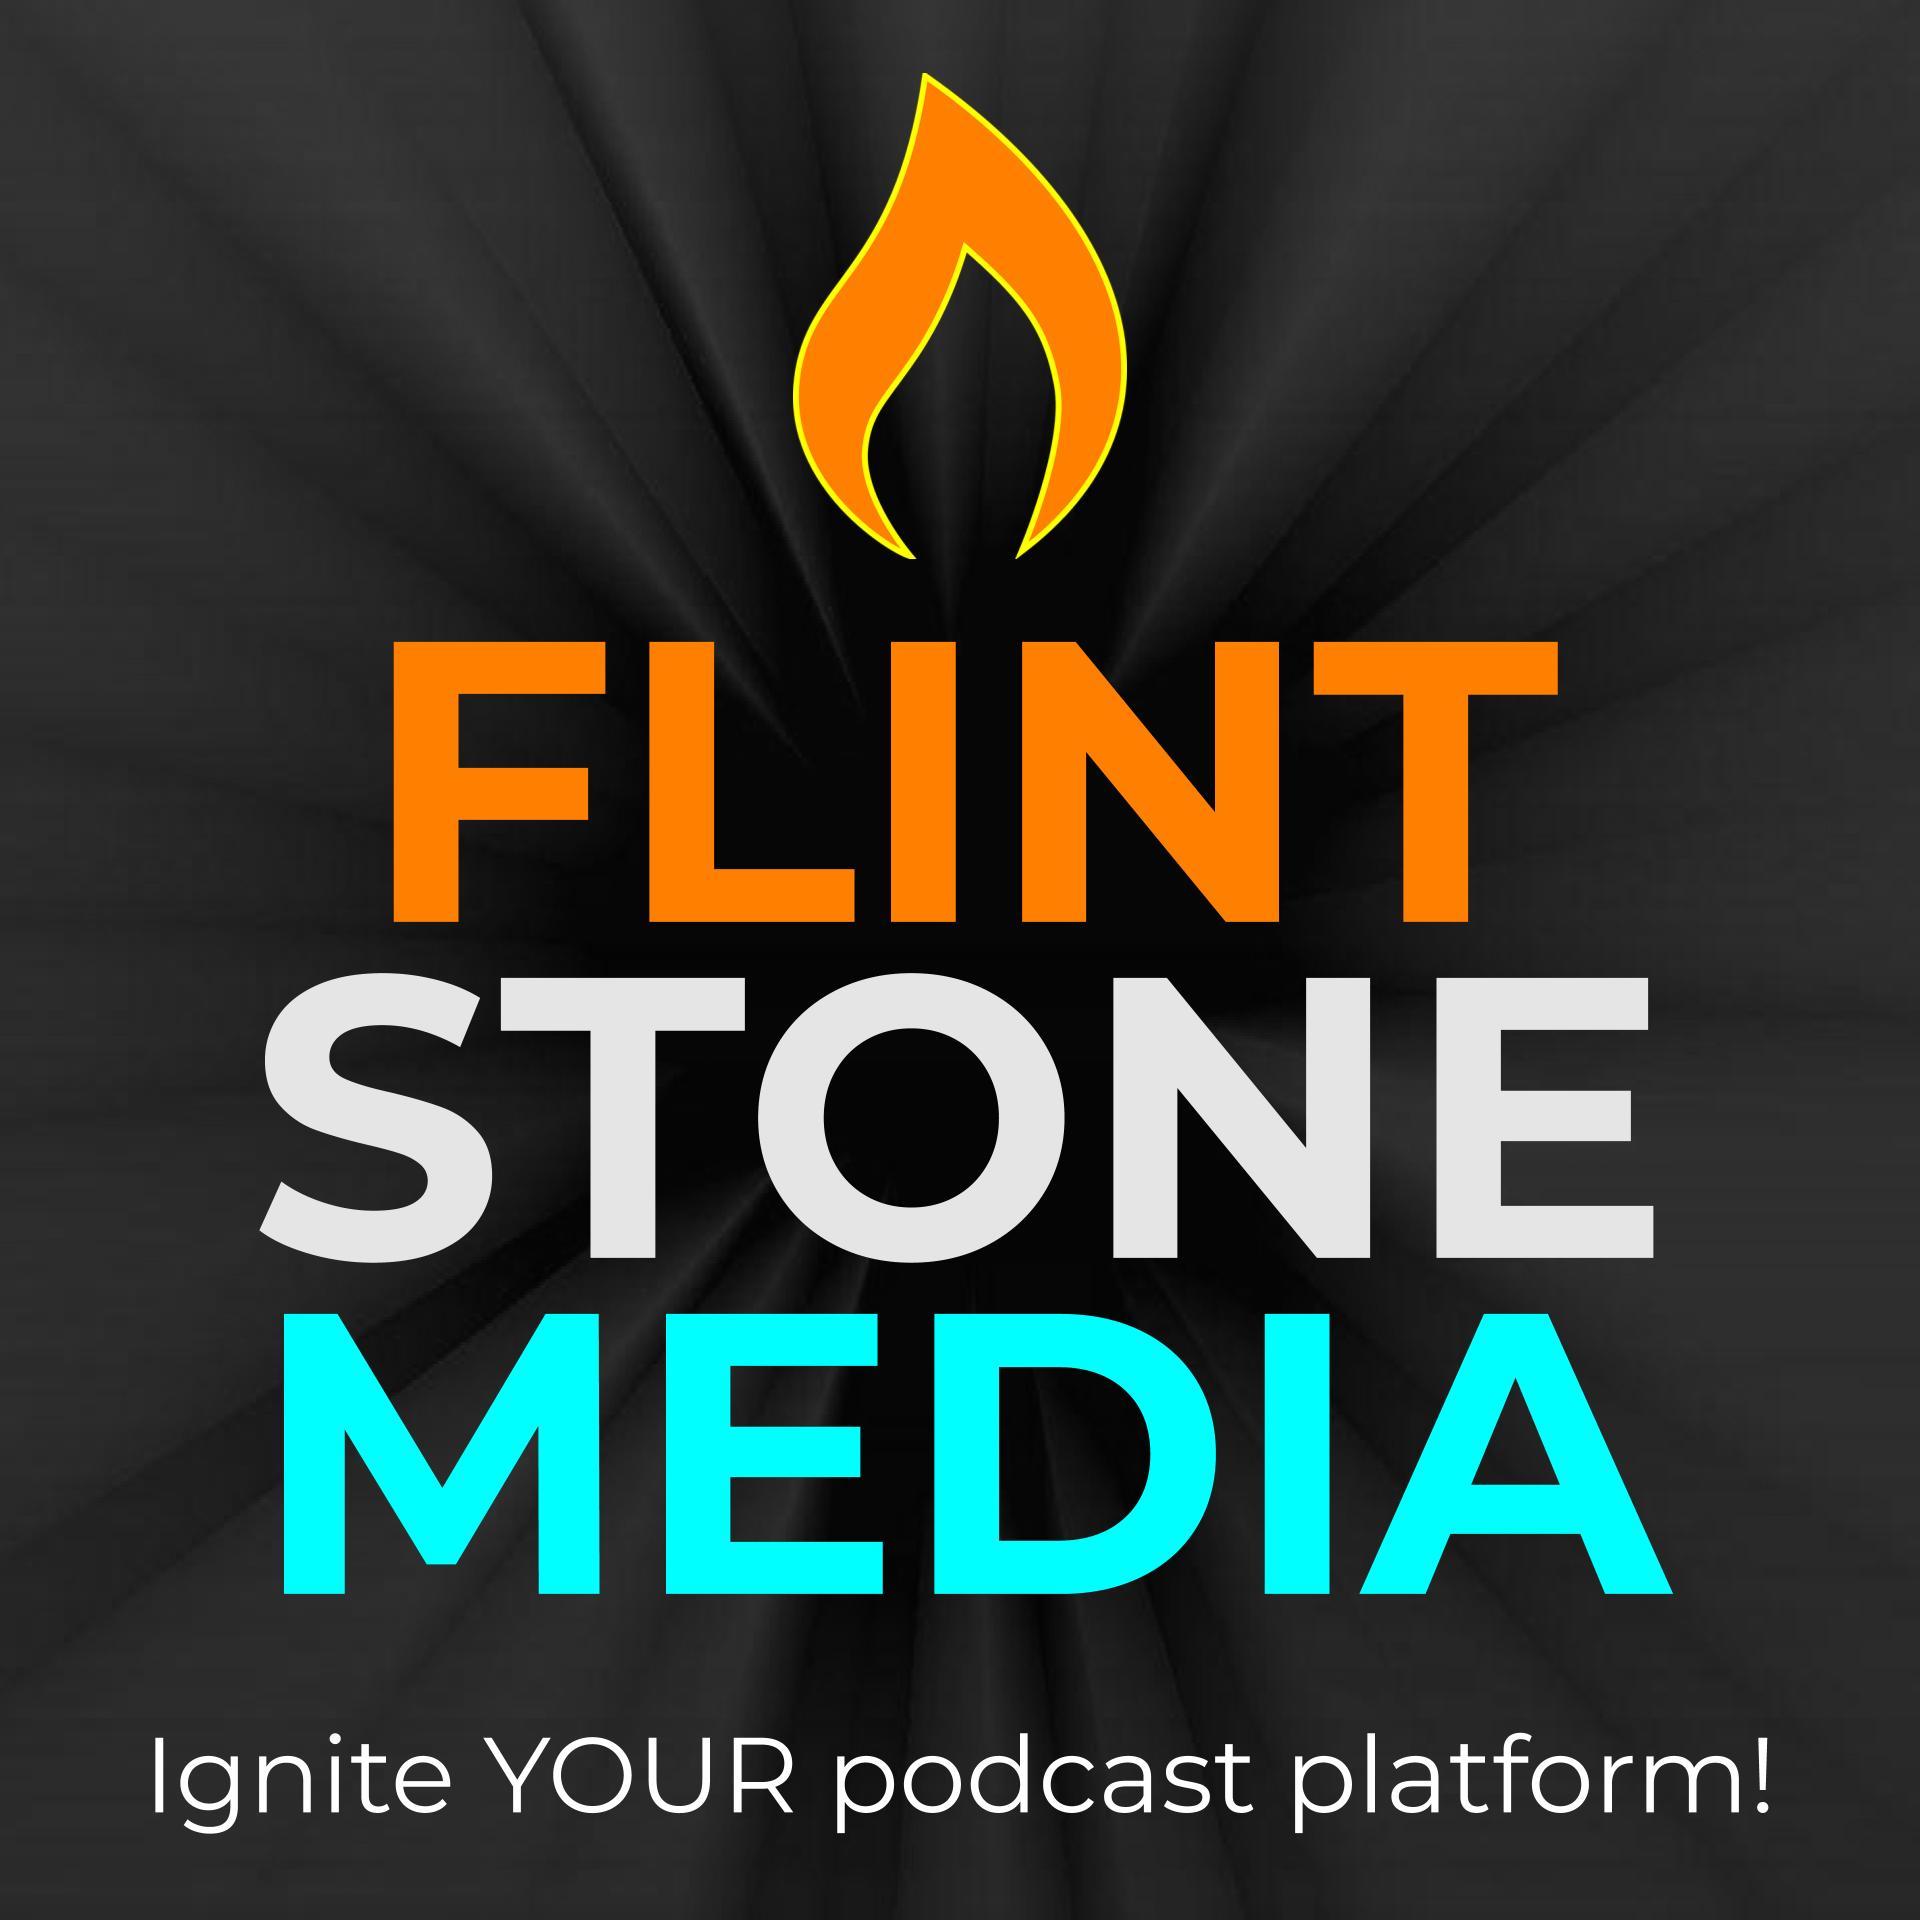 Flint Stone Media LLC